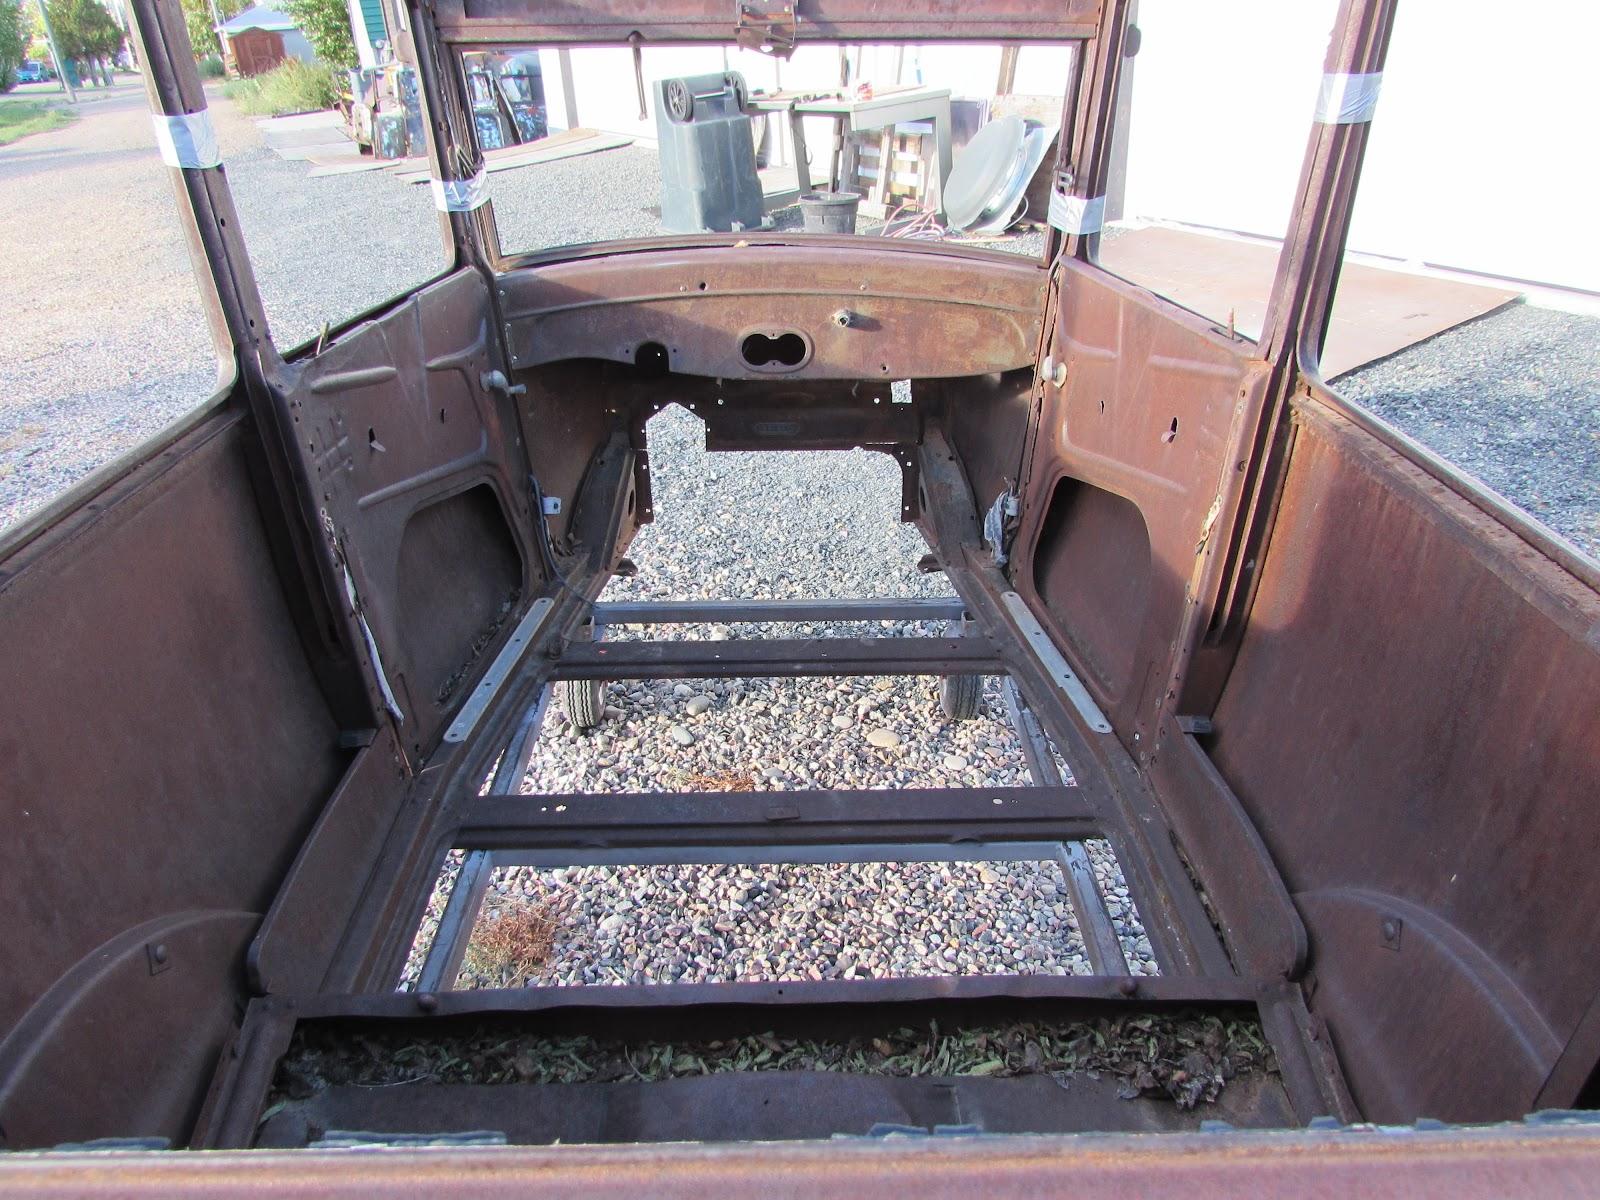 Reel Rods Inc.: FOR SALE: 1926 Ford Model T 2 door sedan body